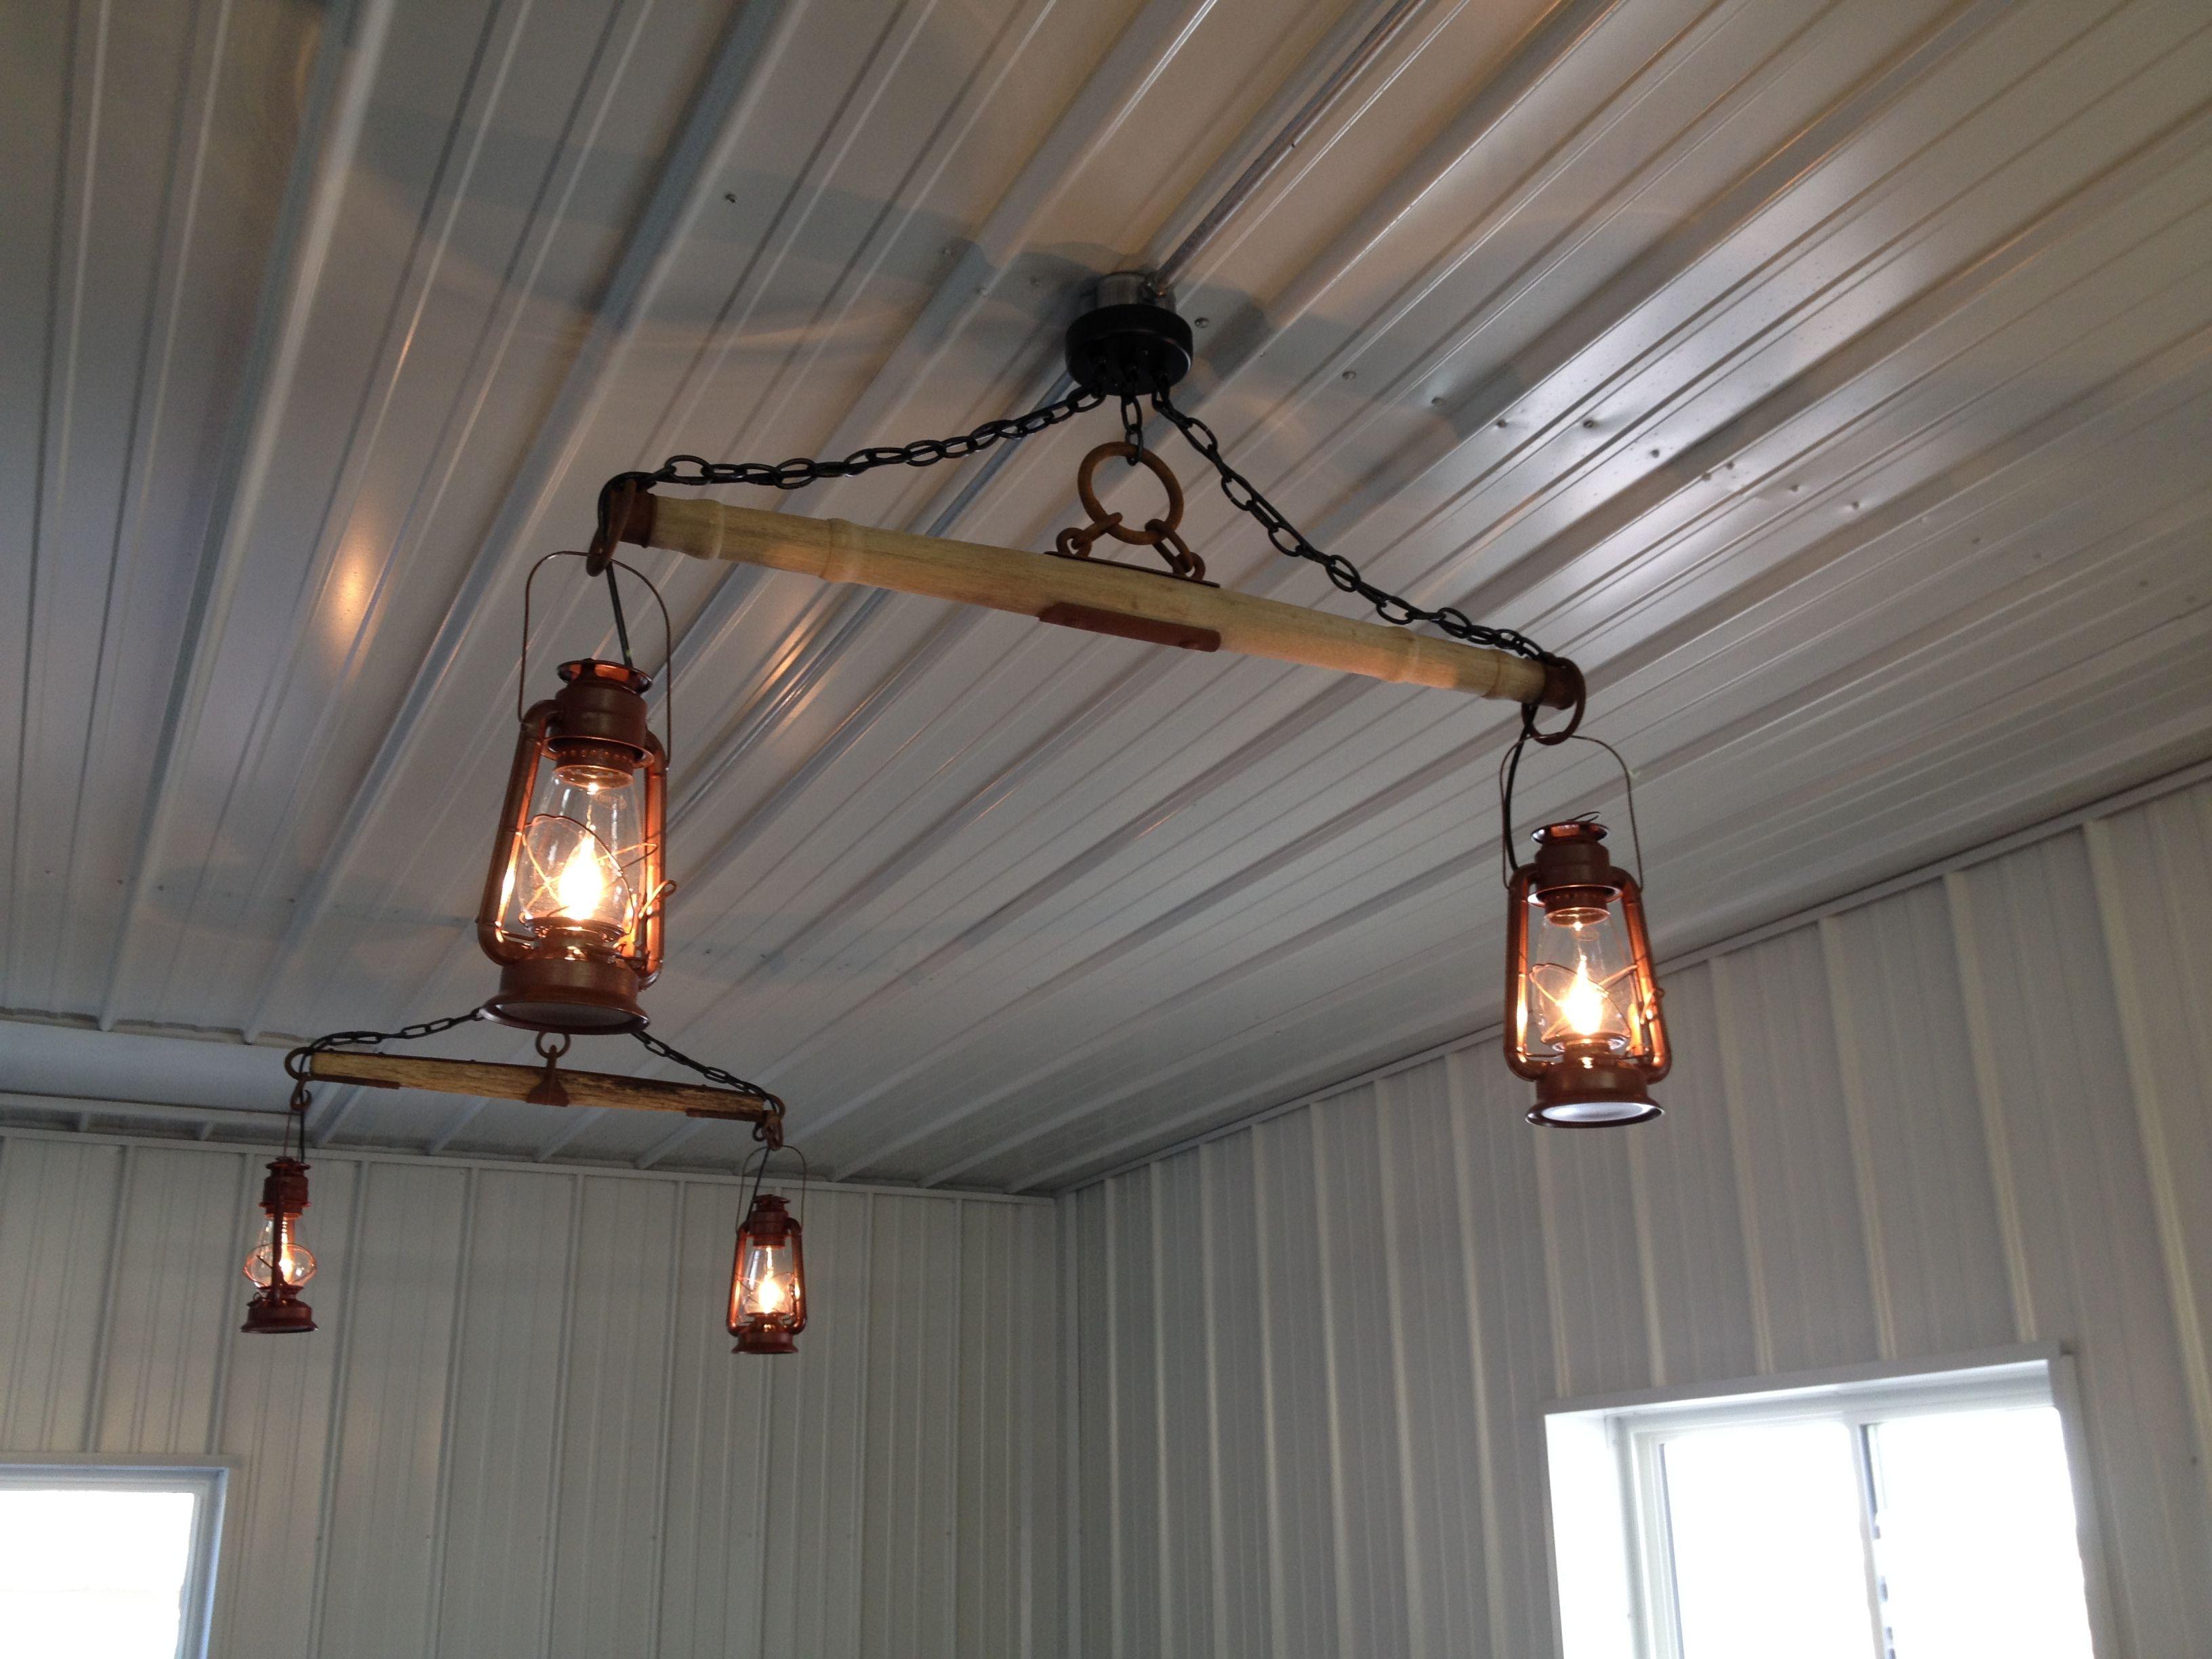 primitive lighting ideas. Lighting In Our Garage Recreation Room Using Electrified Barn Lanterns, Yokes And Single Trees. Wall LightingLighting IdeasPrimitive LightingBarn Primitive Ideas